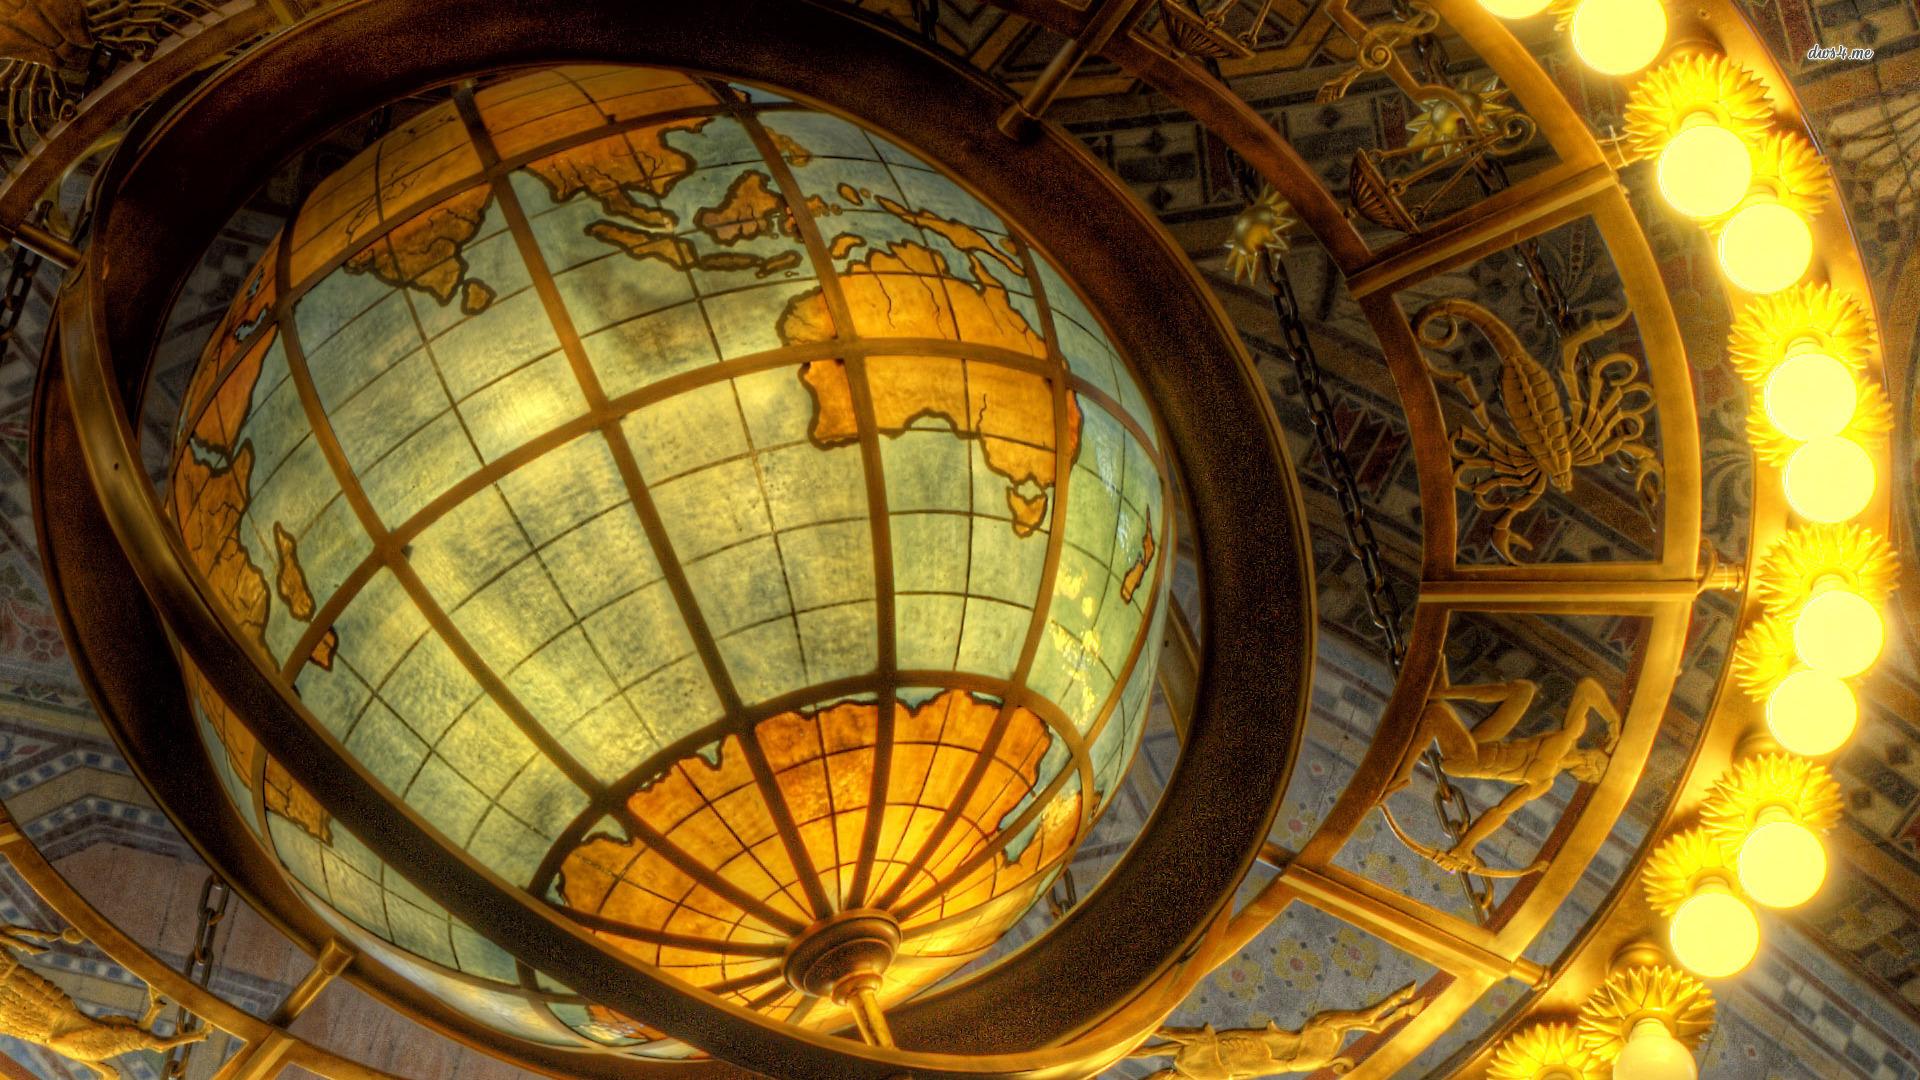 16147-globe-1920x1080-digital-art-wallpaper.jpg